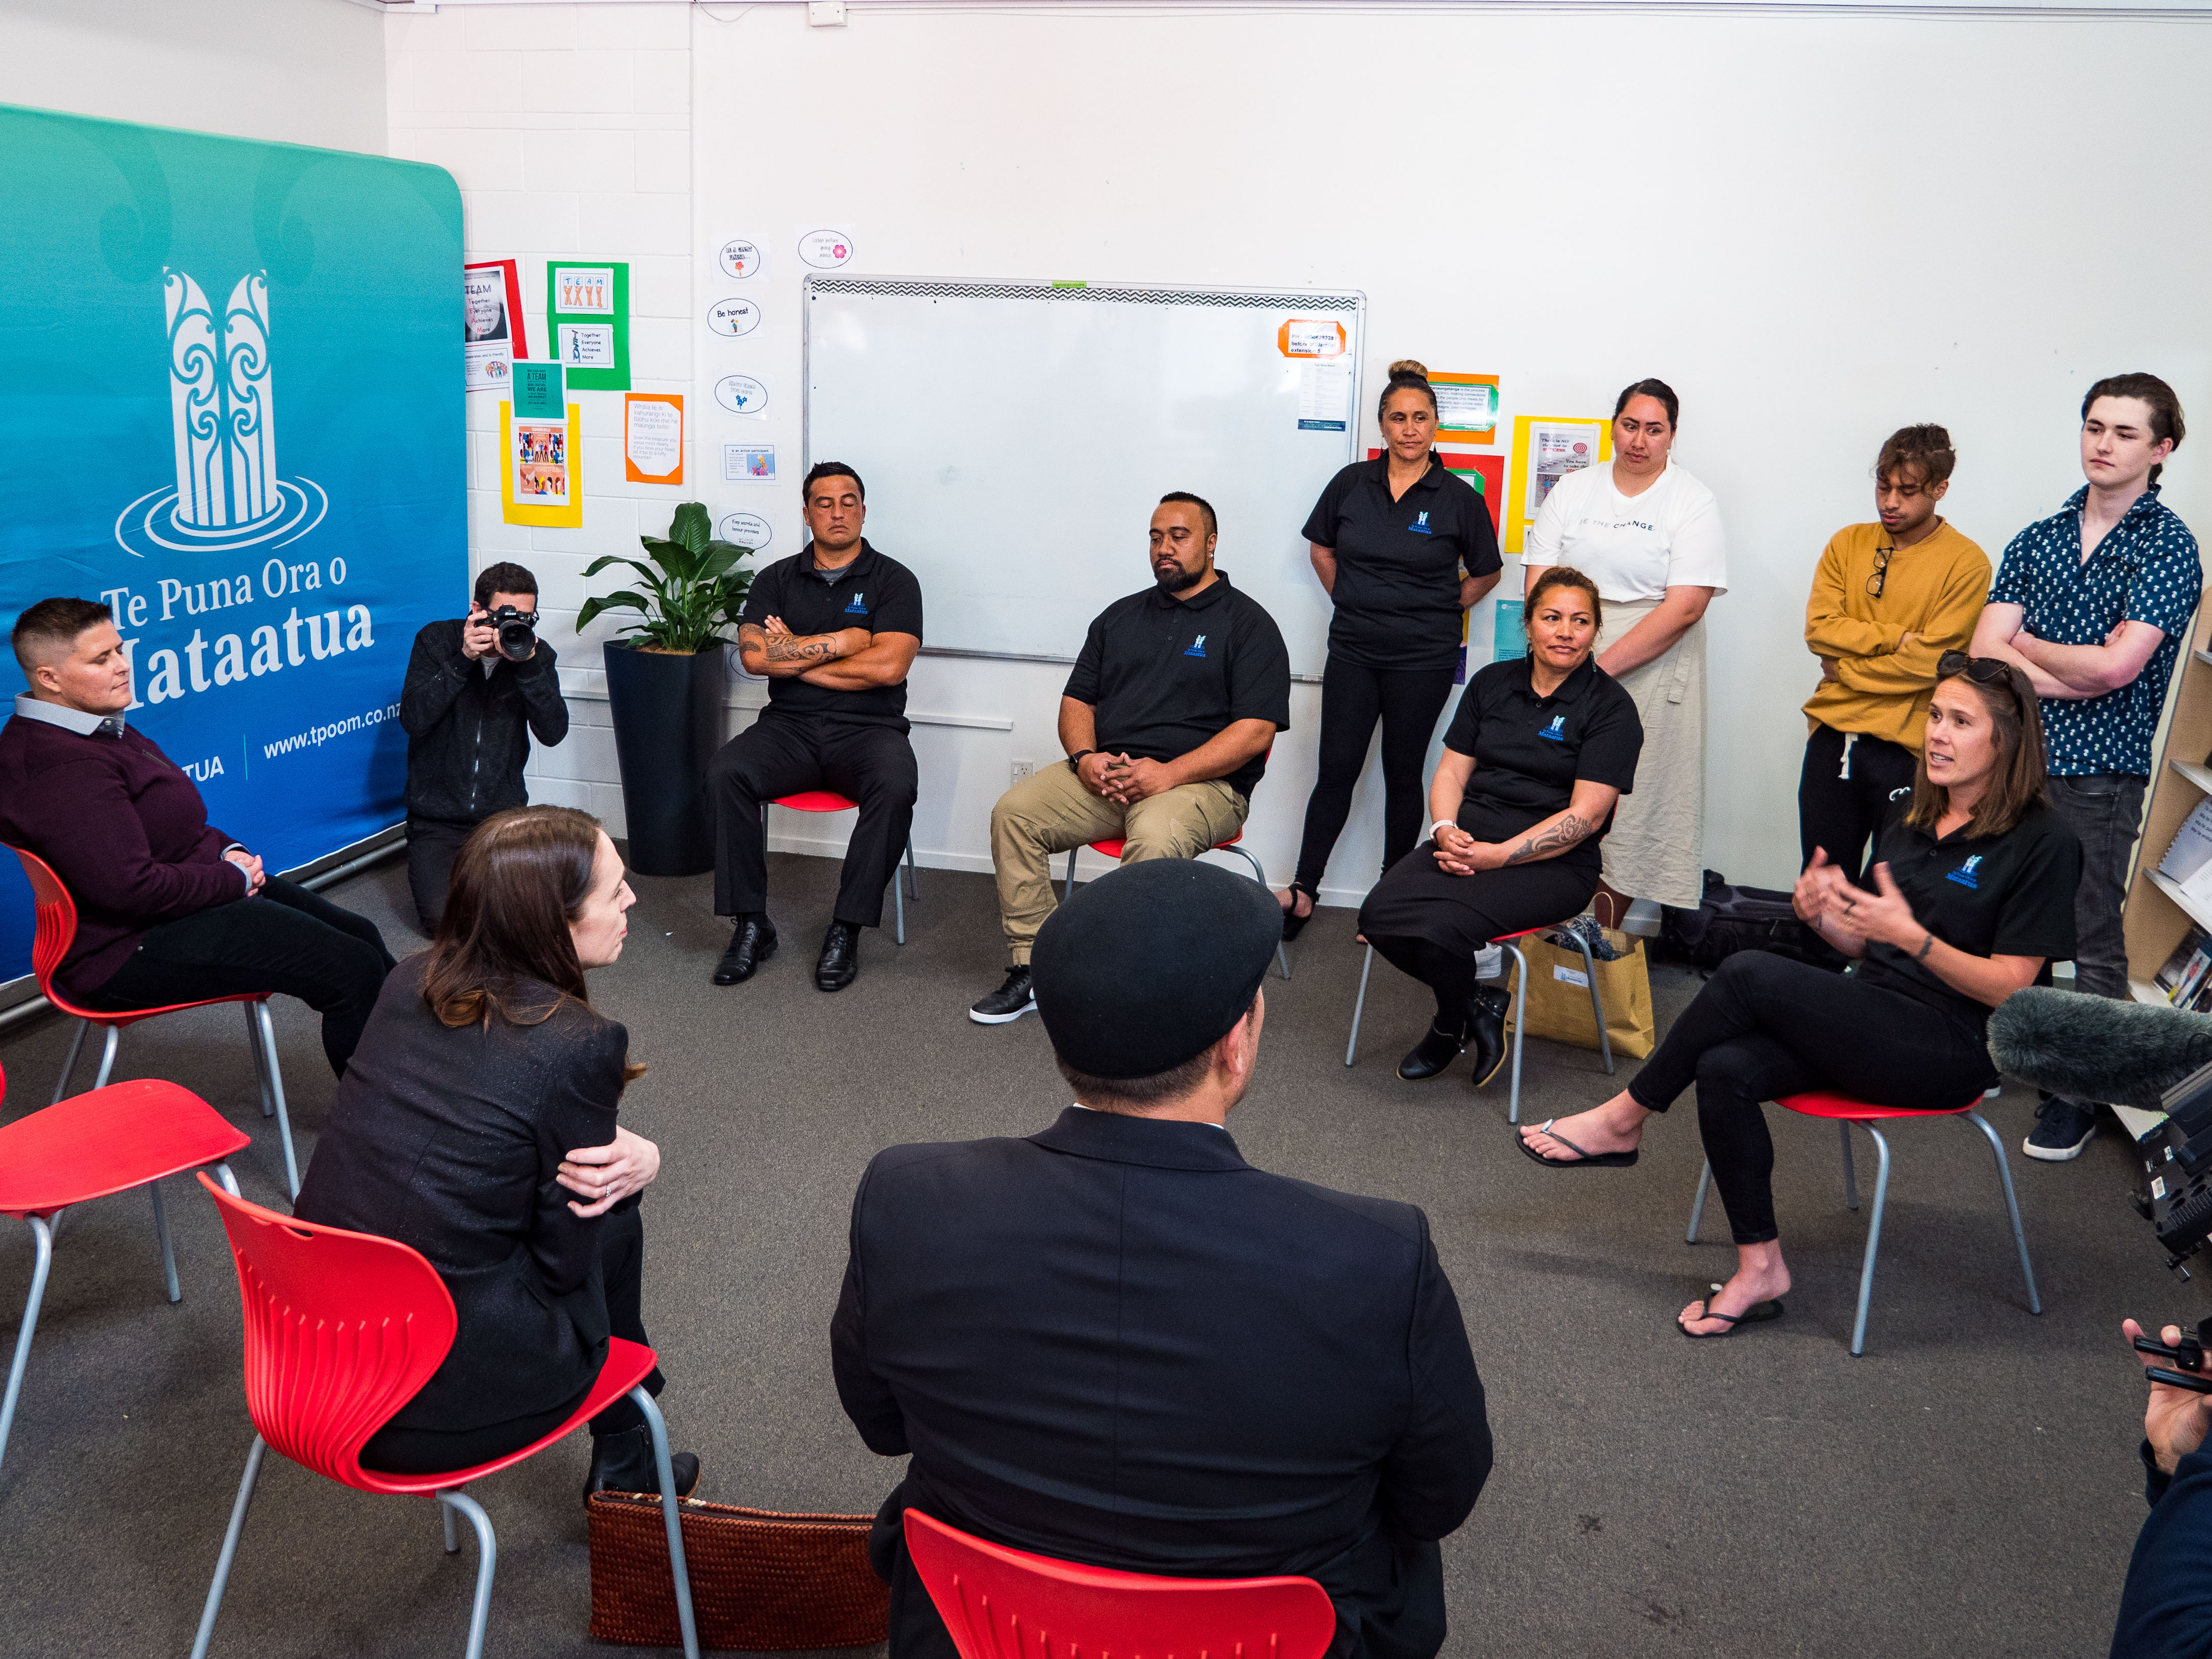 Prime Minister Jacinda Arden listening to group of Te Puna Ora o Mataatua staff members